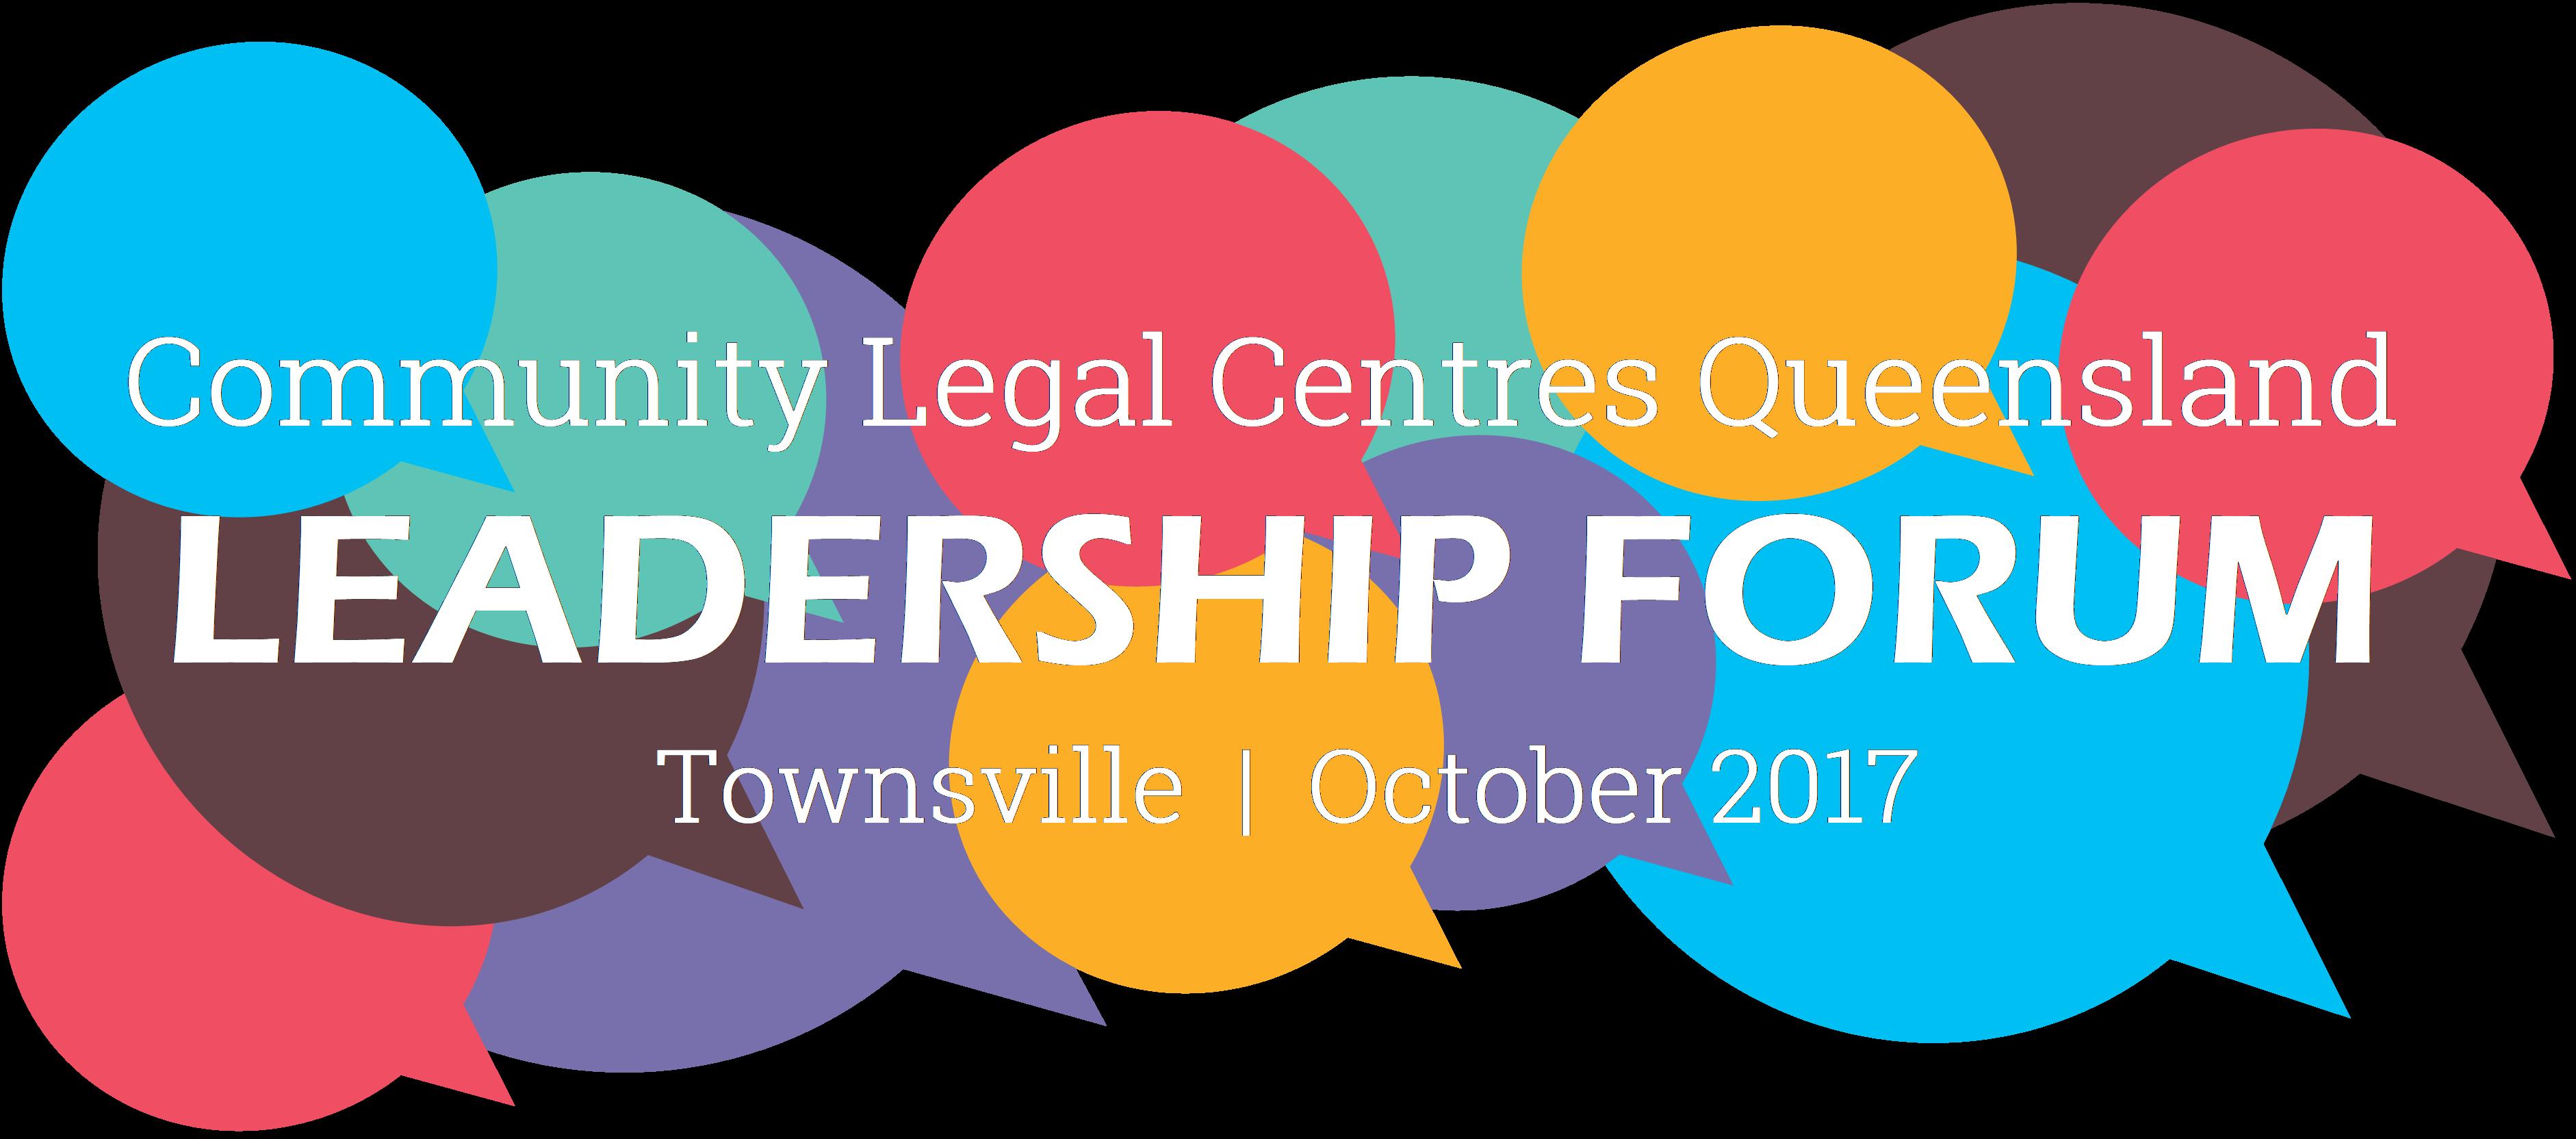 Legal centres queensland leadership. Community clipart community centre